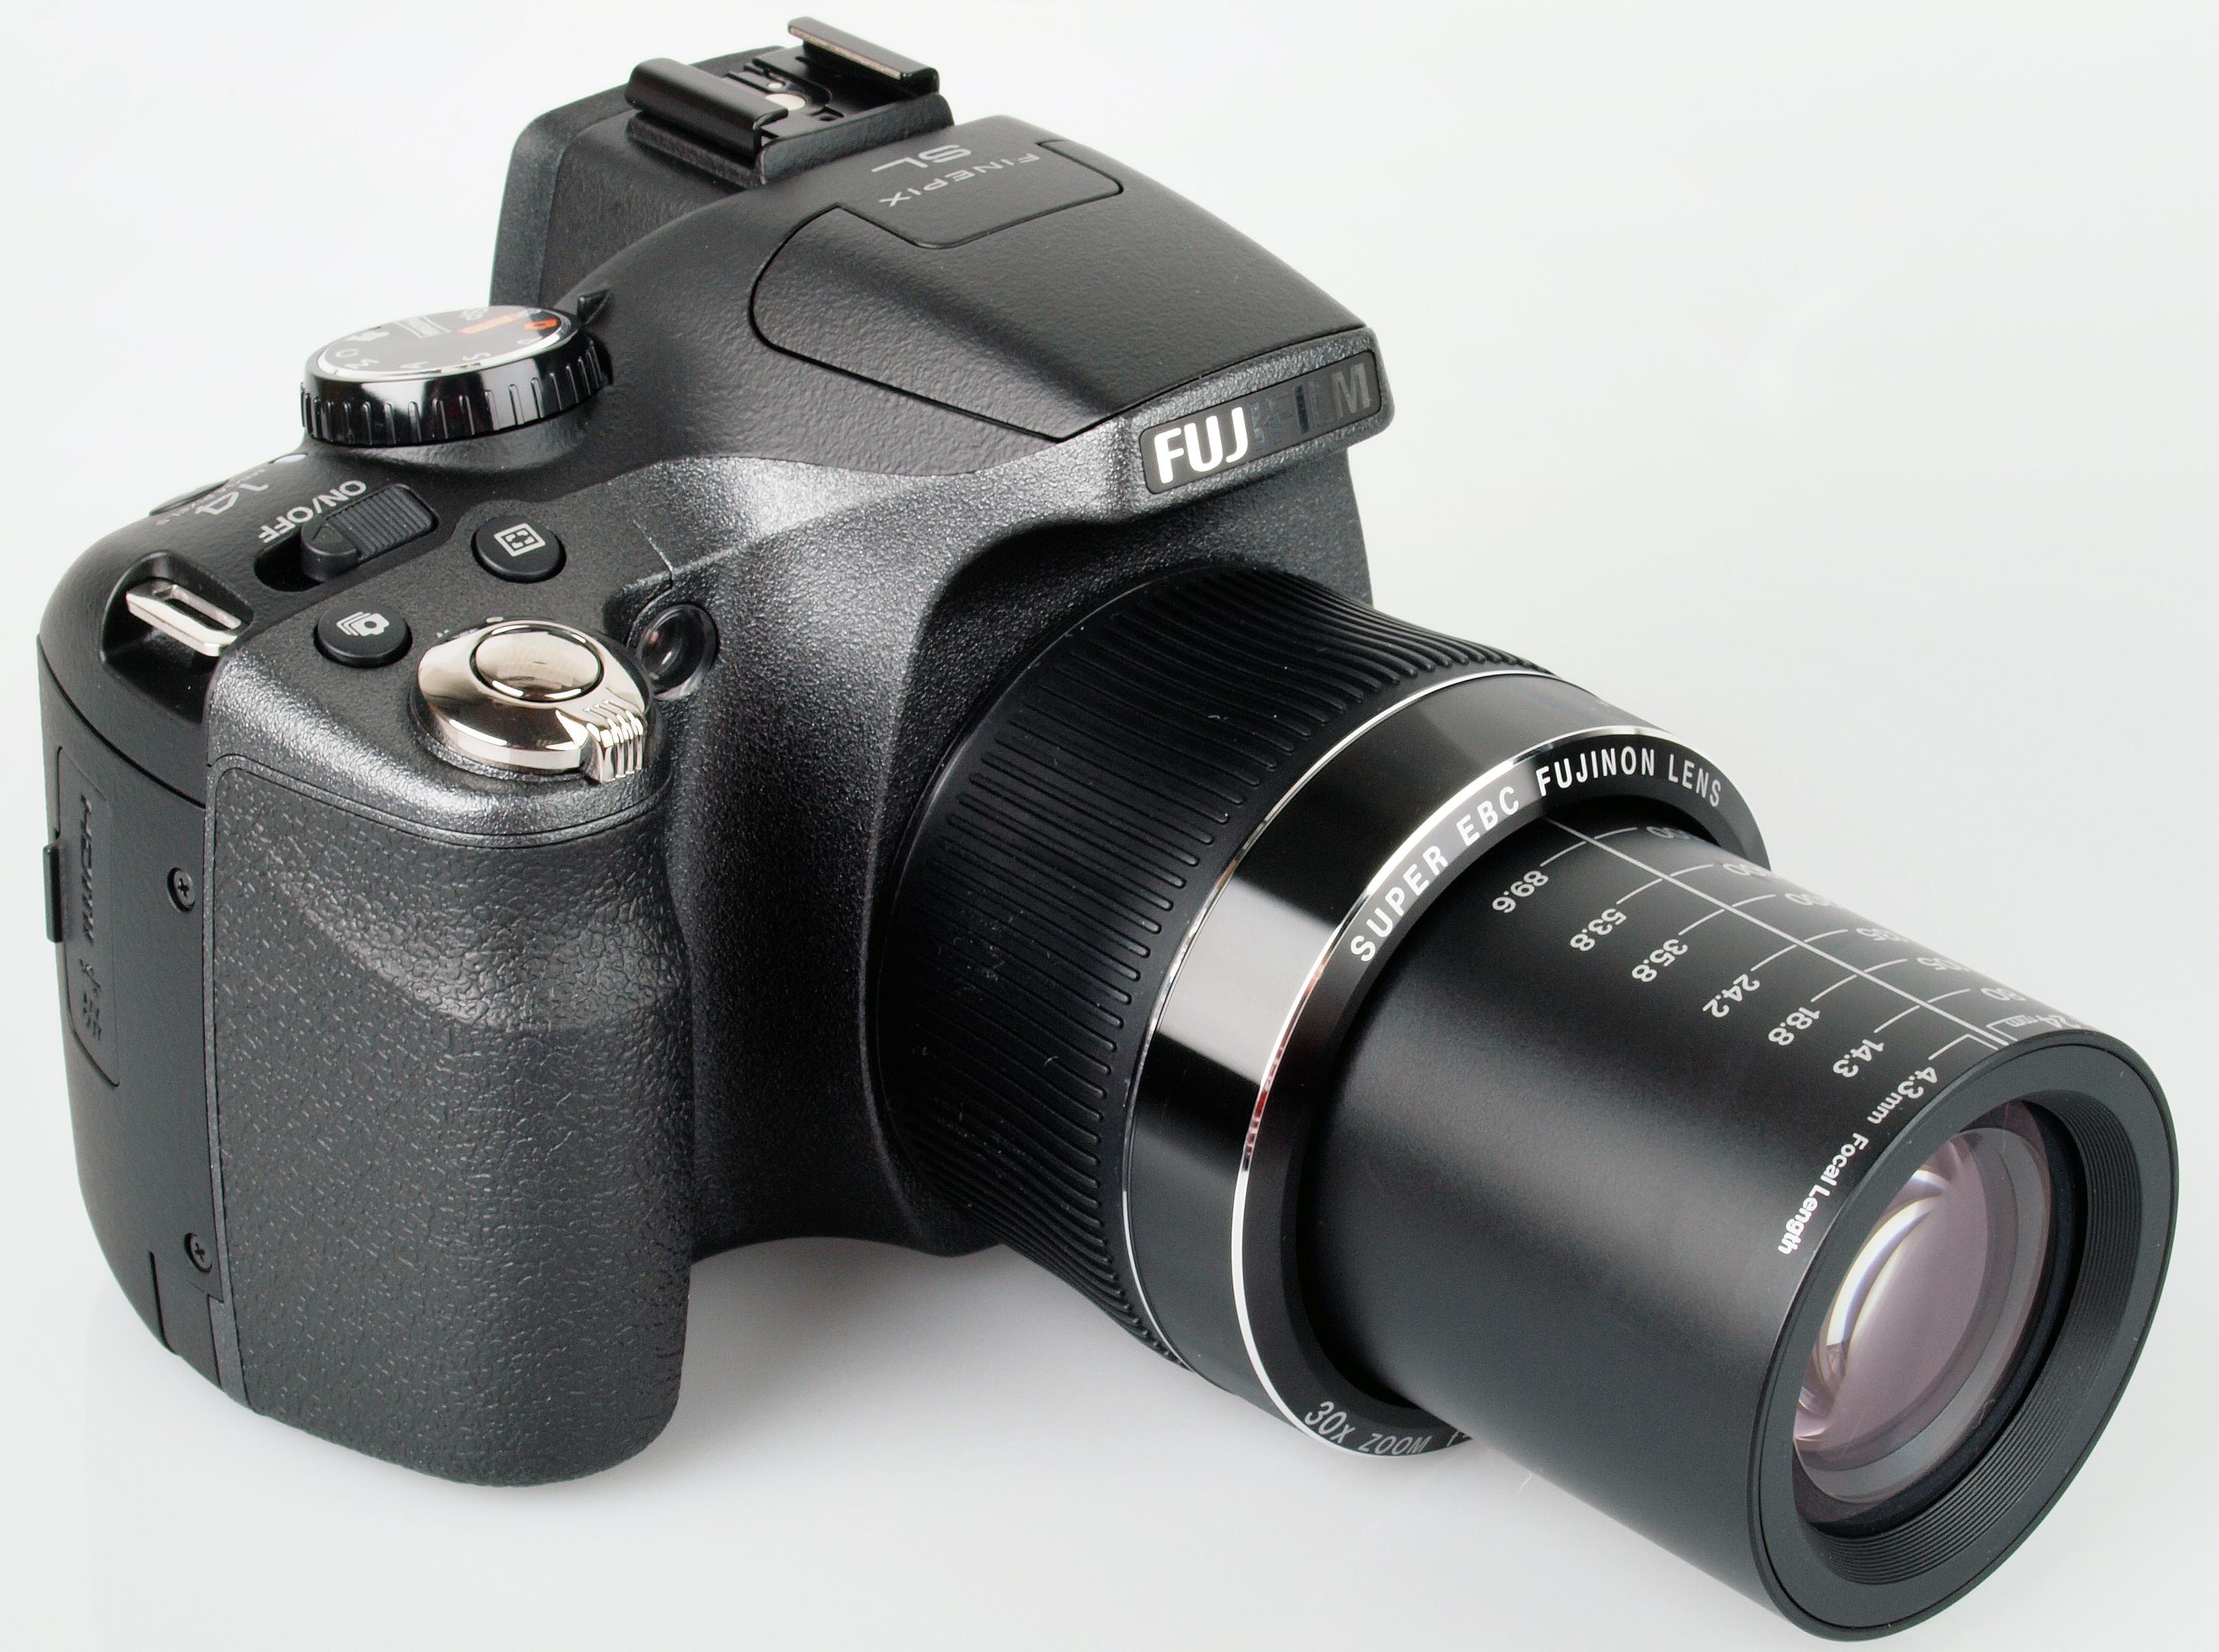 fujifilm finepix sl300 digital camera review rh ephotozine com manual da camera fujifilm finepix sl300 manual camera digital fujifilm finepix sl300